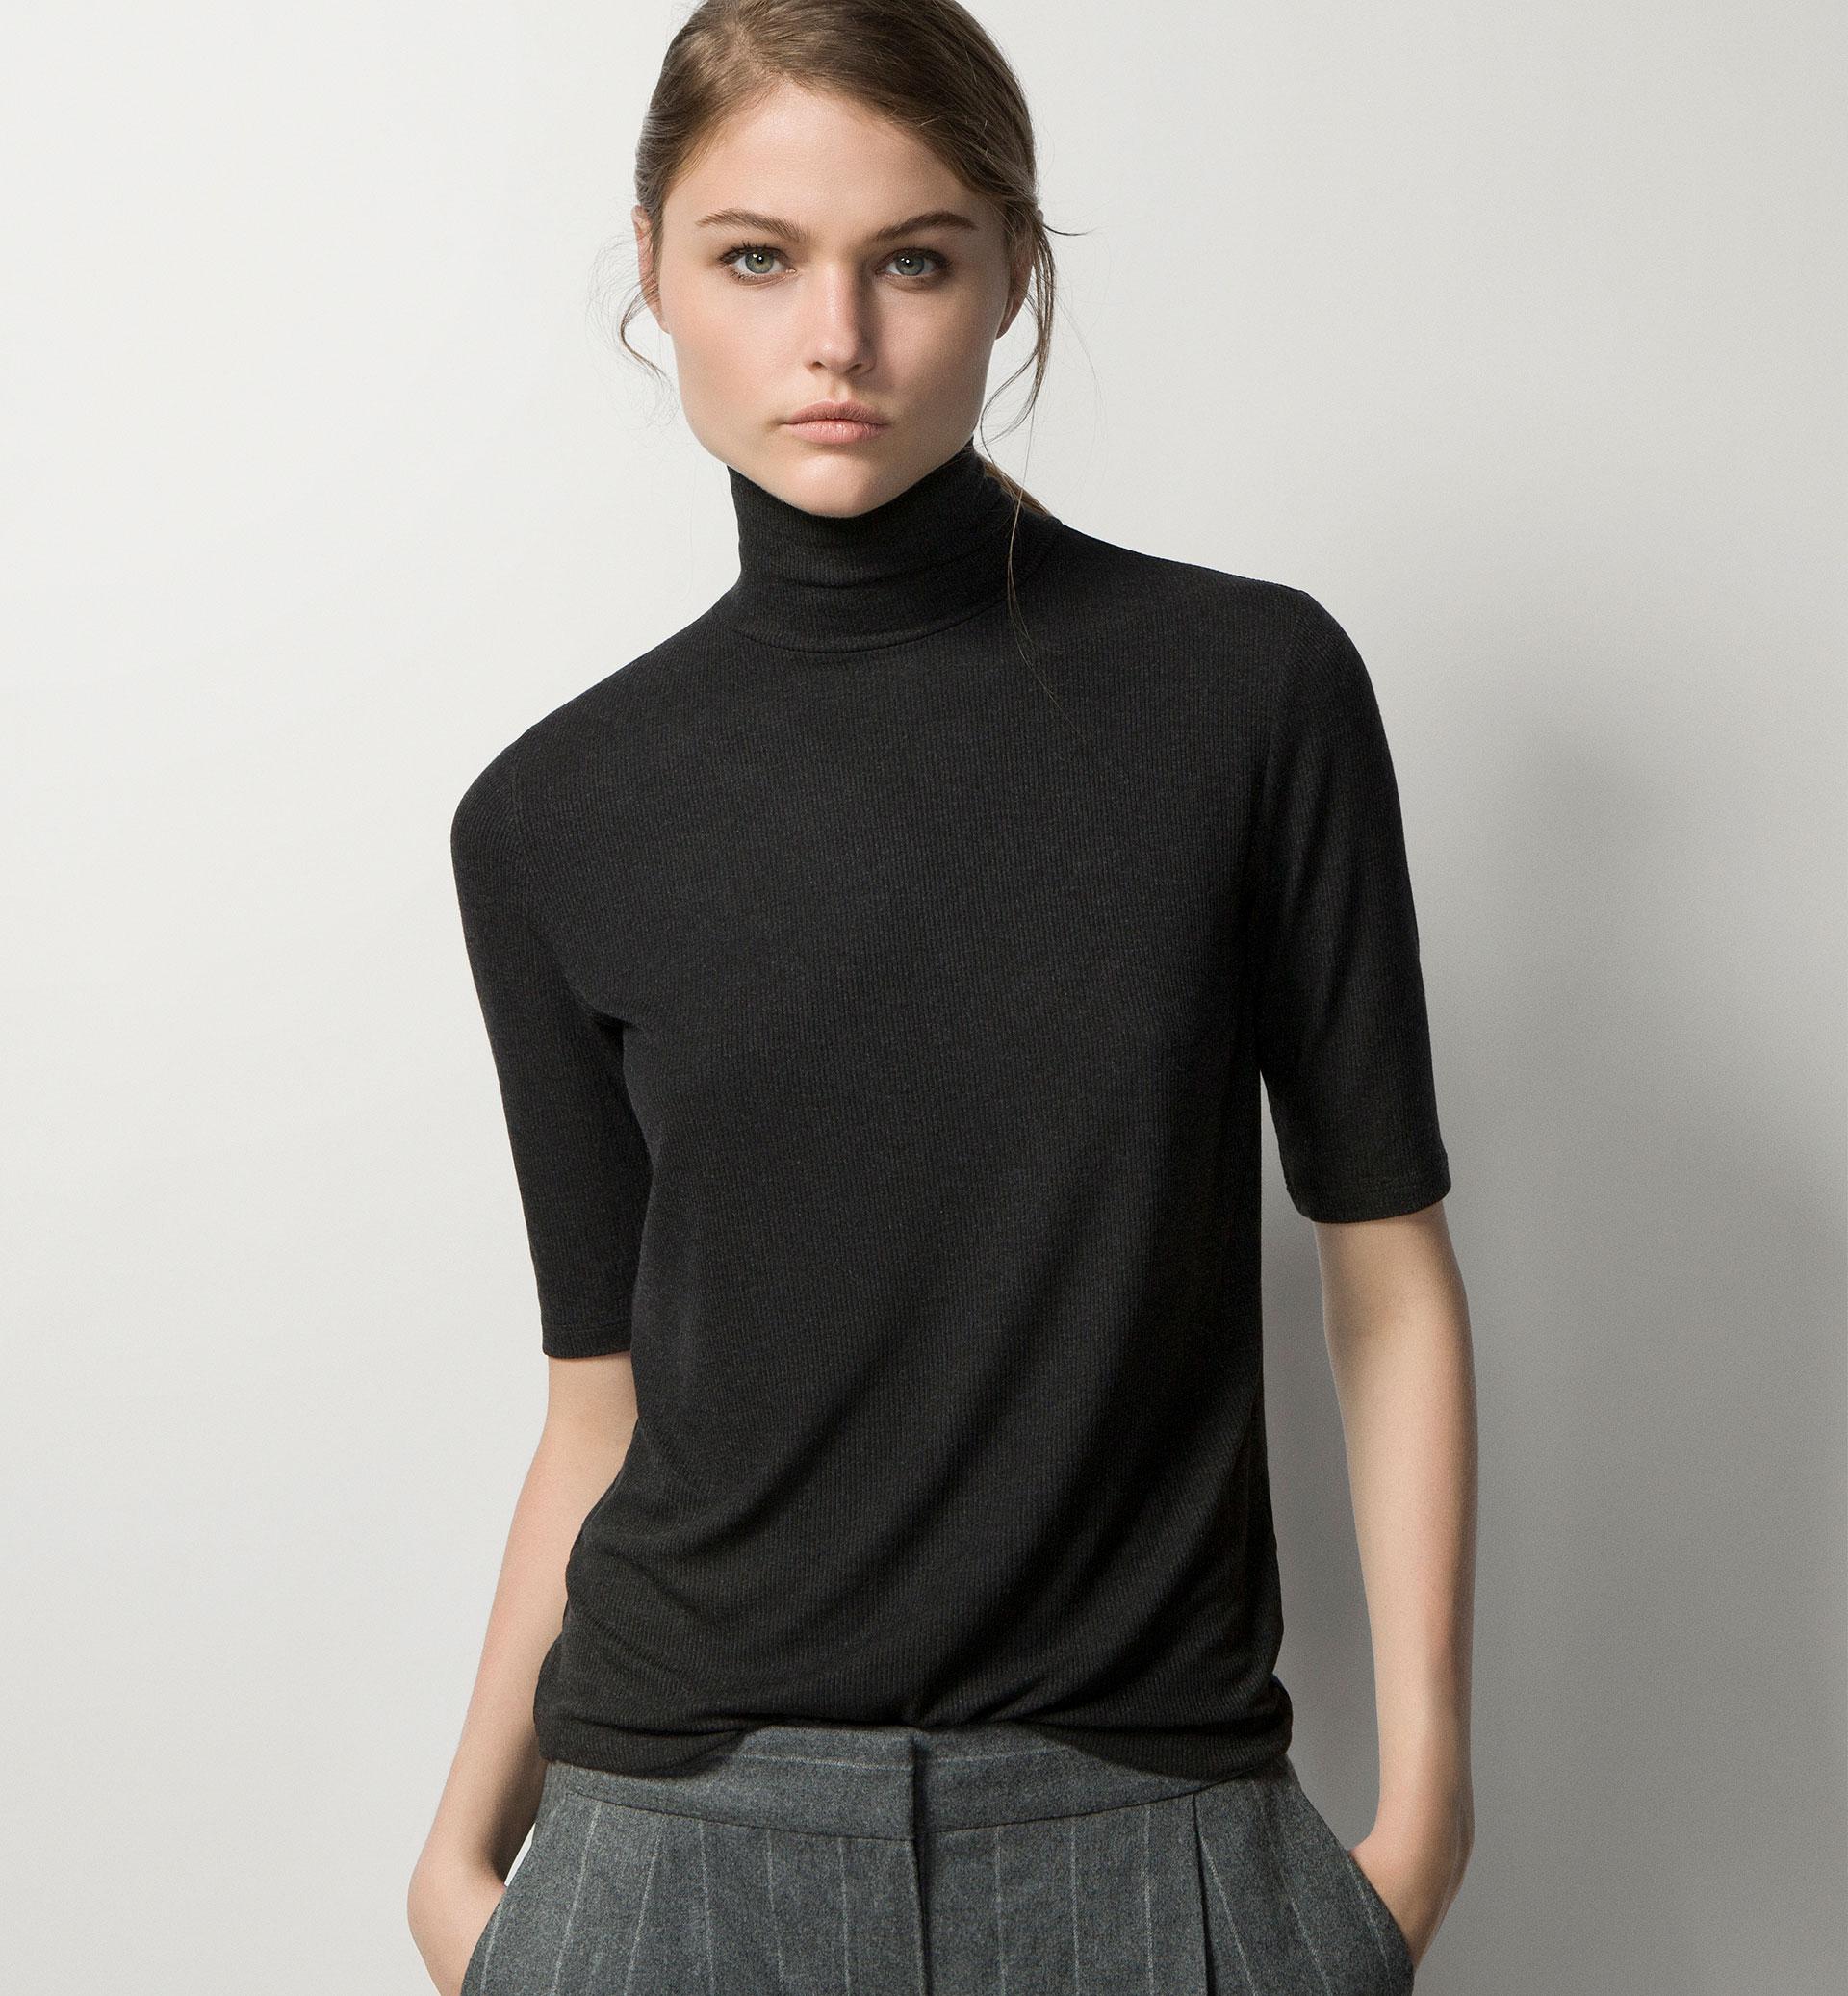 eb24eab13039 RIBBED POLO NECK T-SHIRT - Best Sellers - T-shirts - WOMEN - United Kingdom  - Massimo Dutti